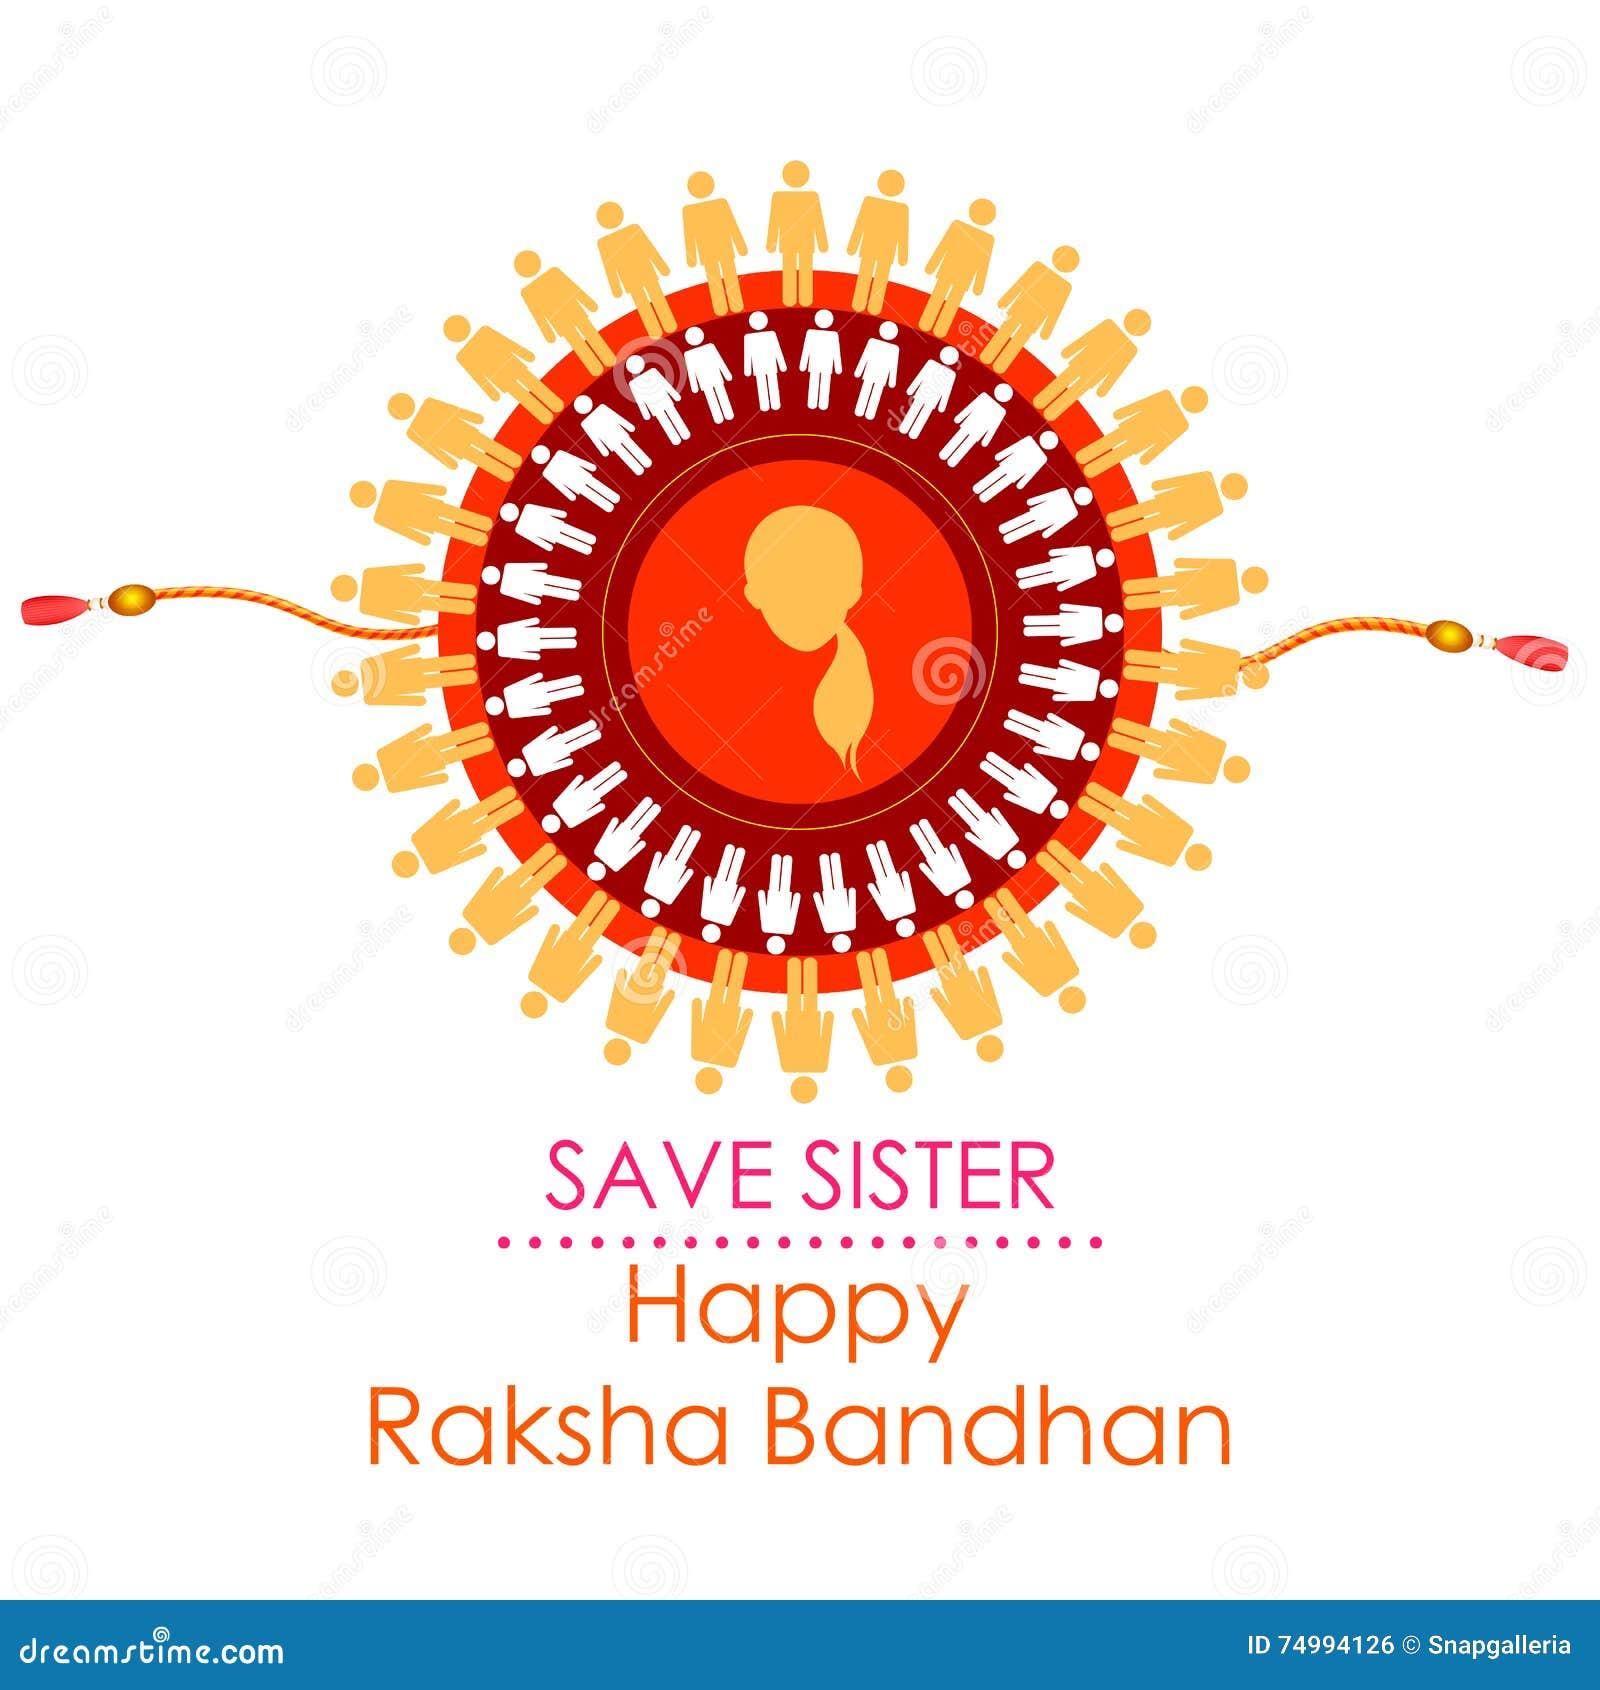 raksha bandhan festival essay Short essay, speech & poems on raksha bandhan rakhi for school students in english & hindi read the long article history of rakhi for children people of india.